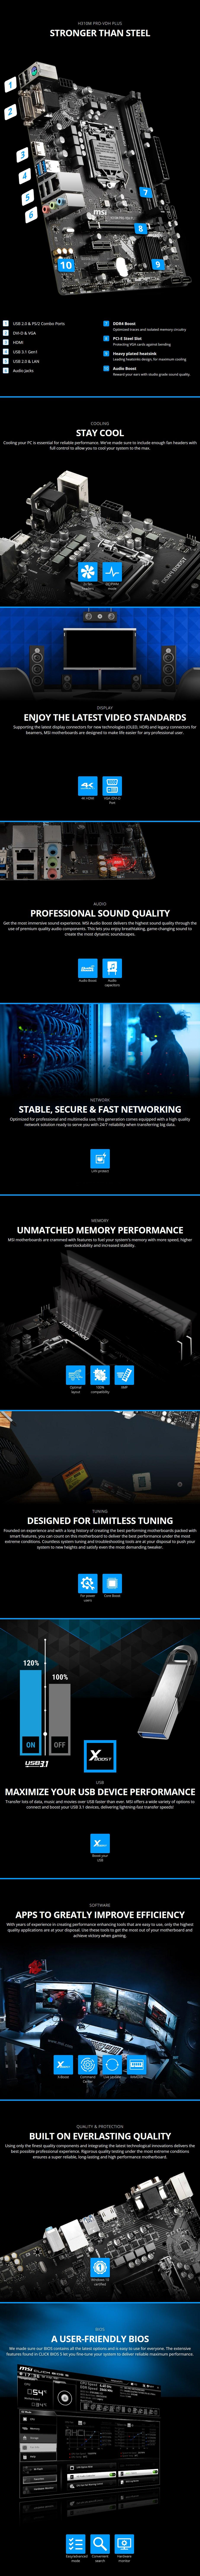 MSI H310M PRO-VDH PLUS LGA 1151 Micro-ATX Motherboard - Overview 1